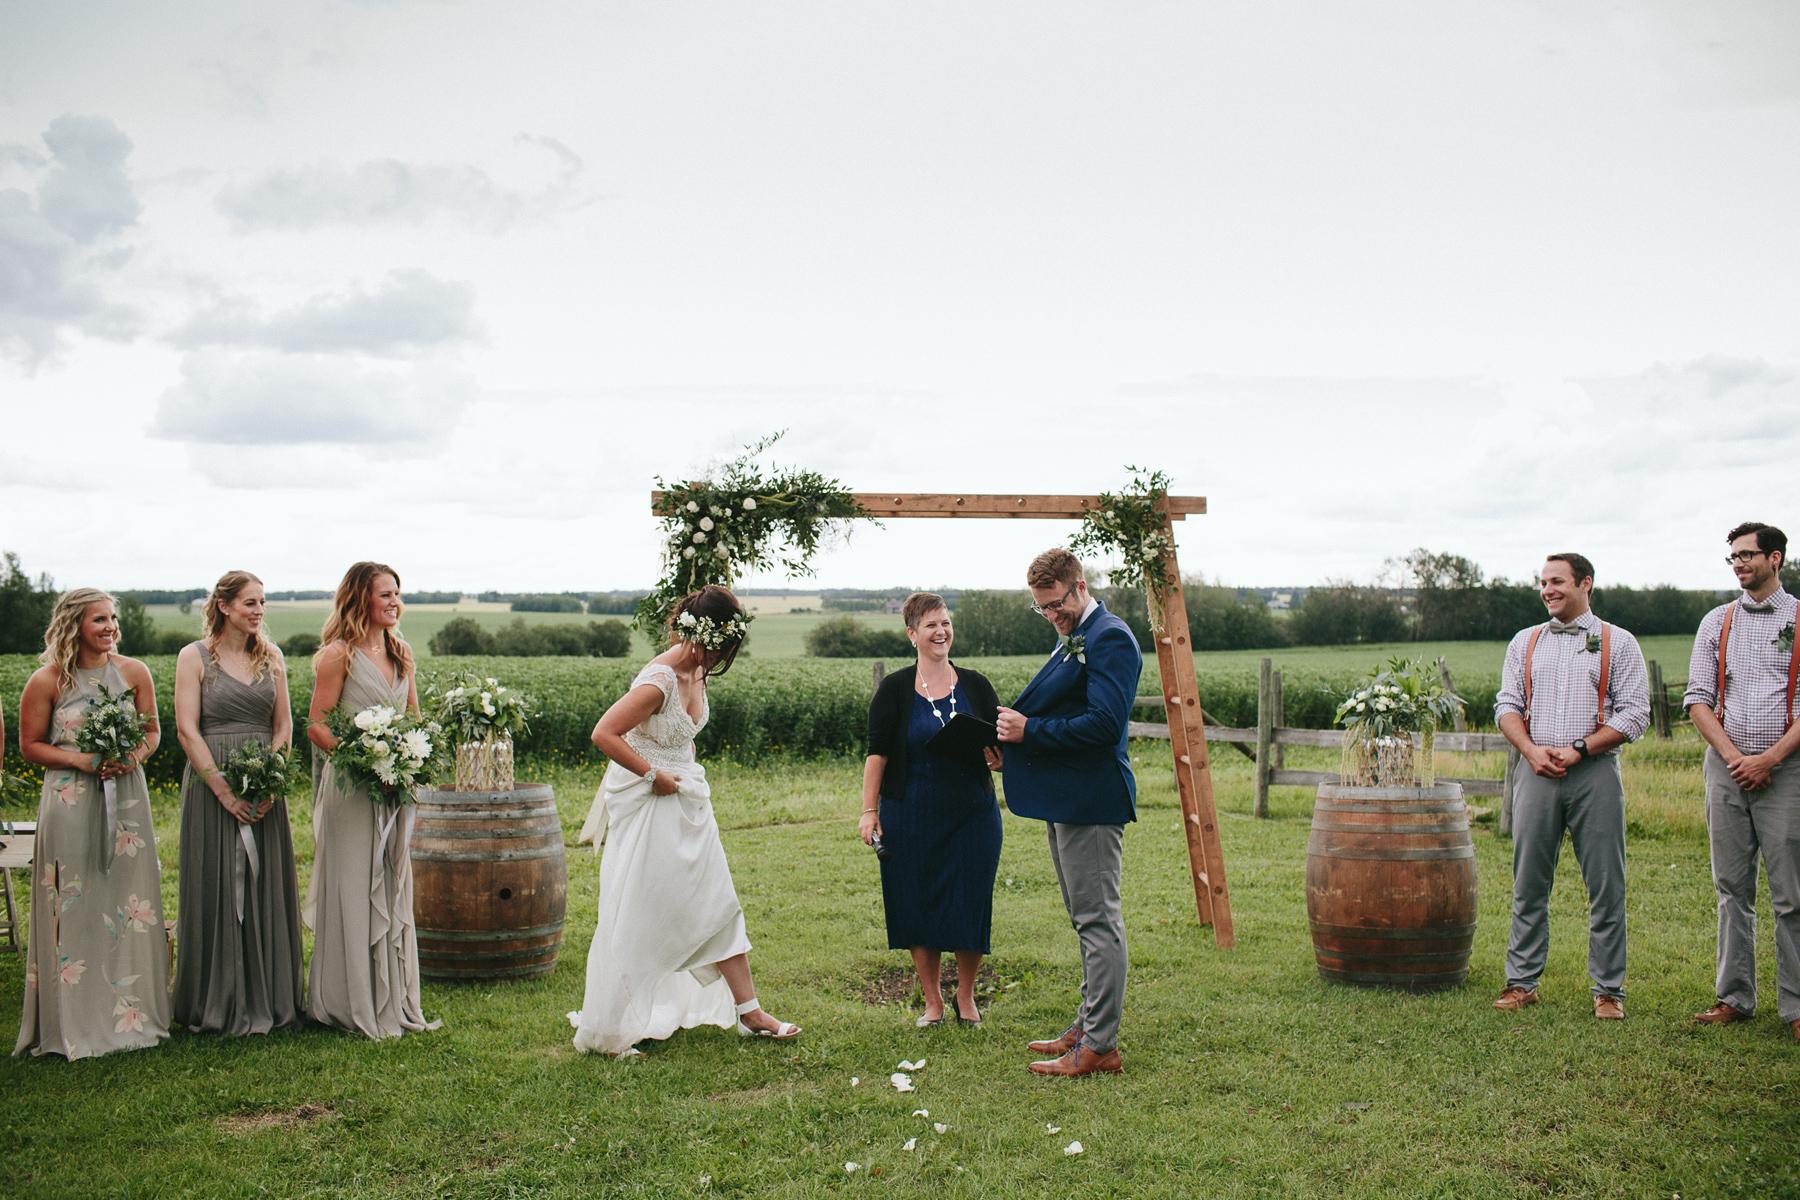 alberta-farm-wedding-photographer-rp-wj-113.jpg